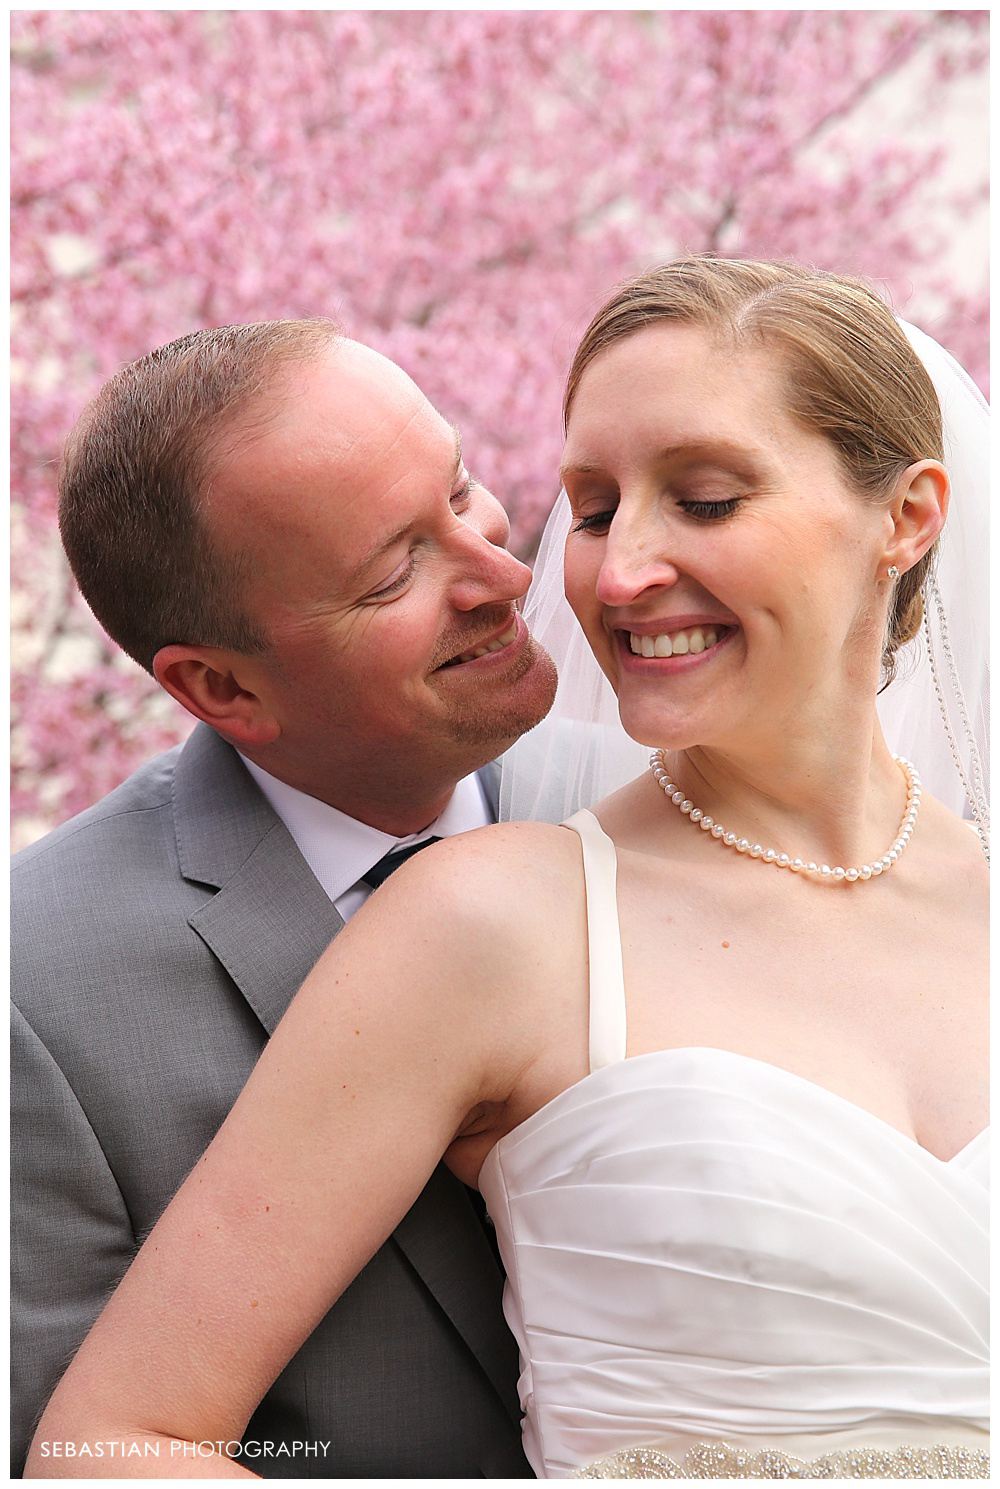 Sebastian_Photography_Wadsworth_Mansion_Middletown_CT_Wedding_Portraits_Spring18.jpg